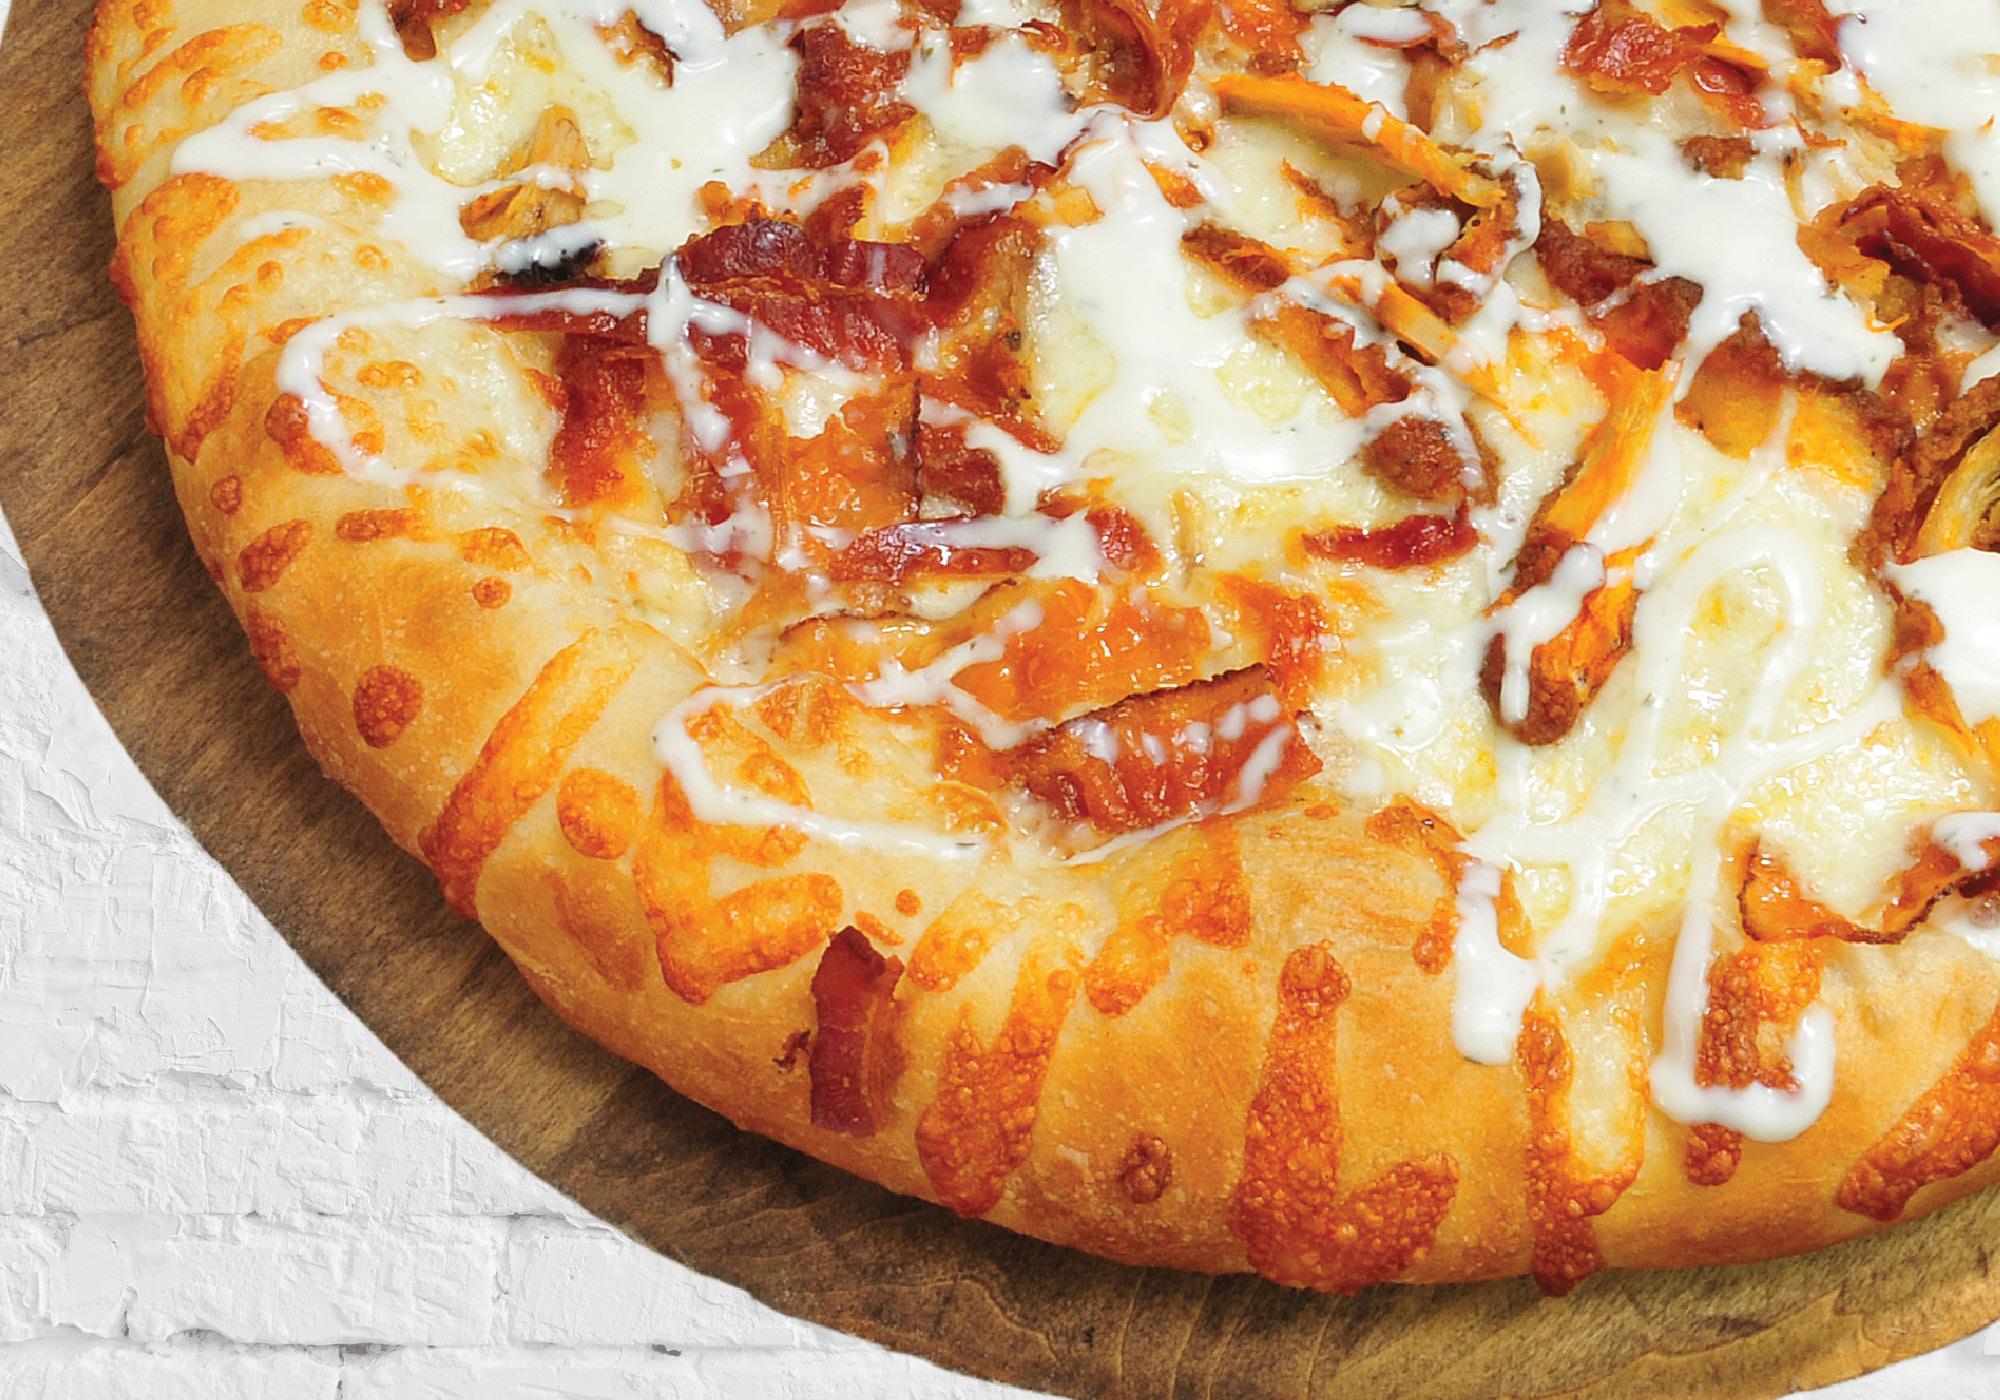 newest frozen pizza dough products